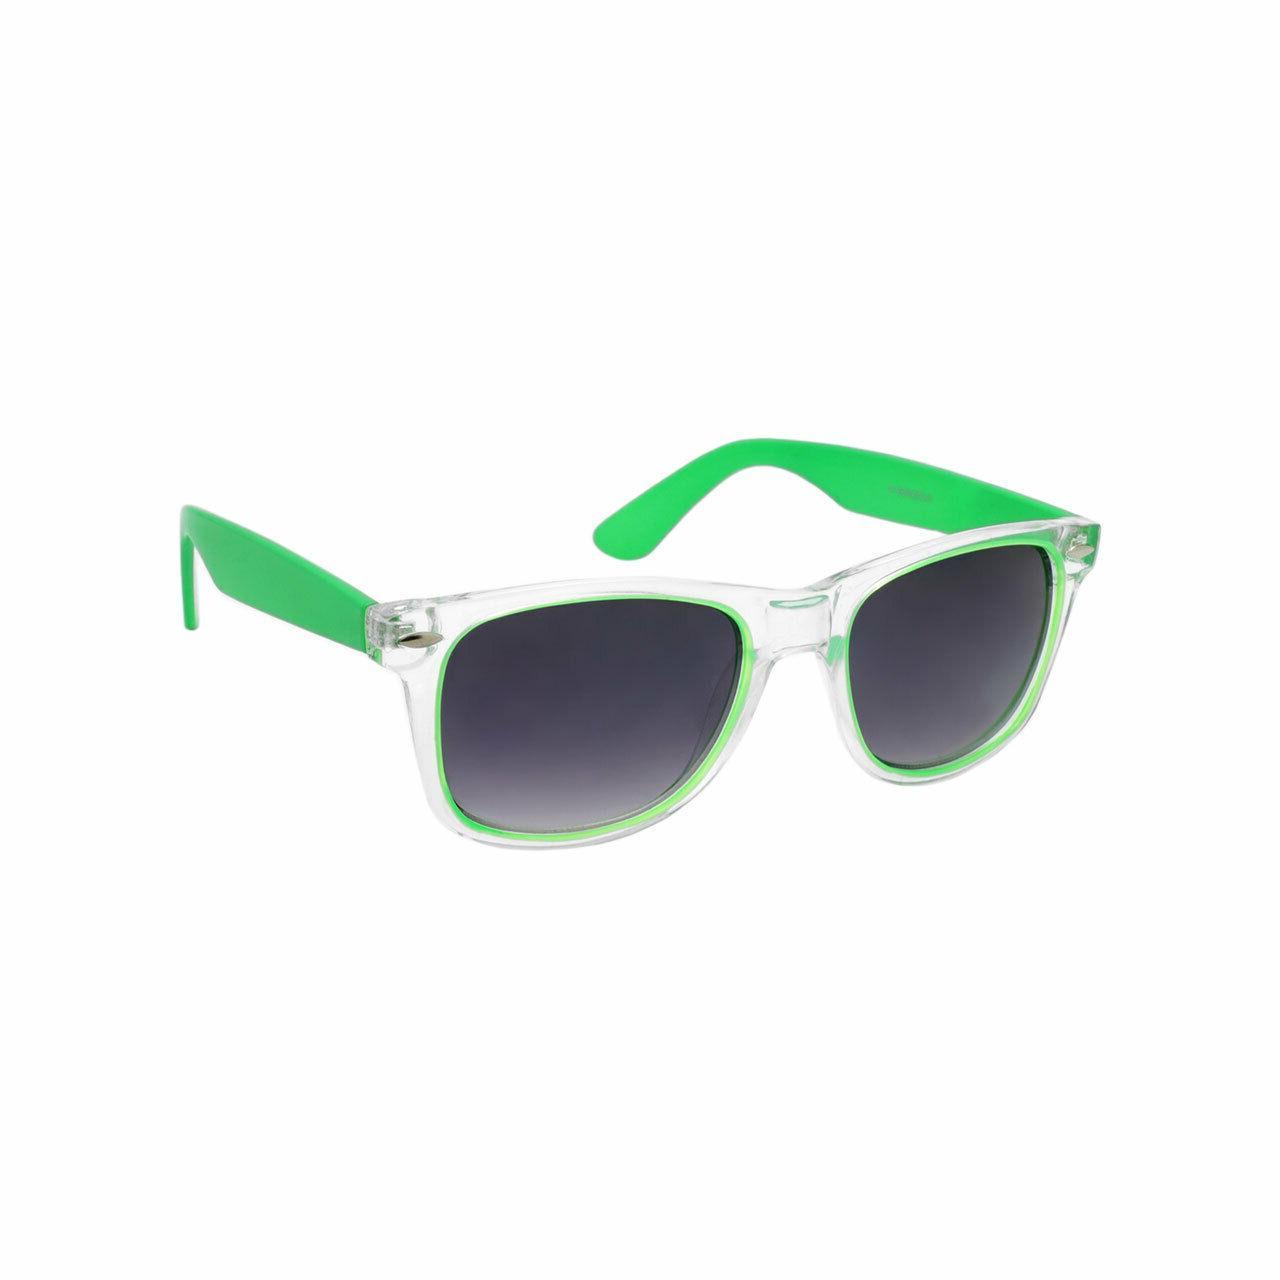 Bulk Sunglasses 36 PC Box Styles Styles